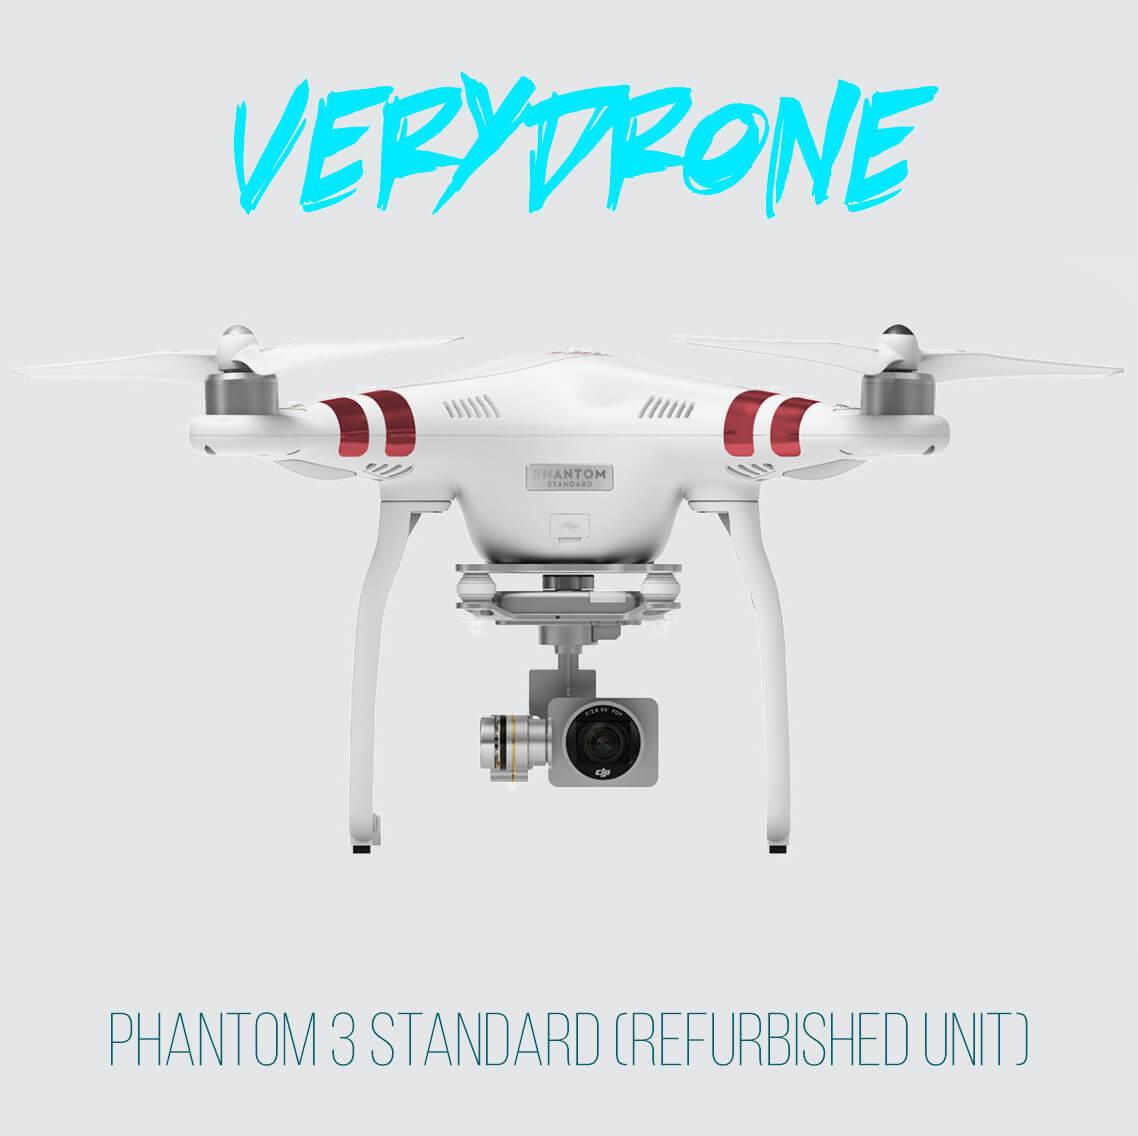 DJI Phantom 3 Standard (Refurbished Unit)